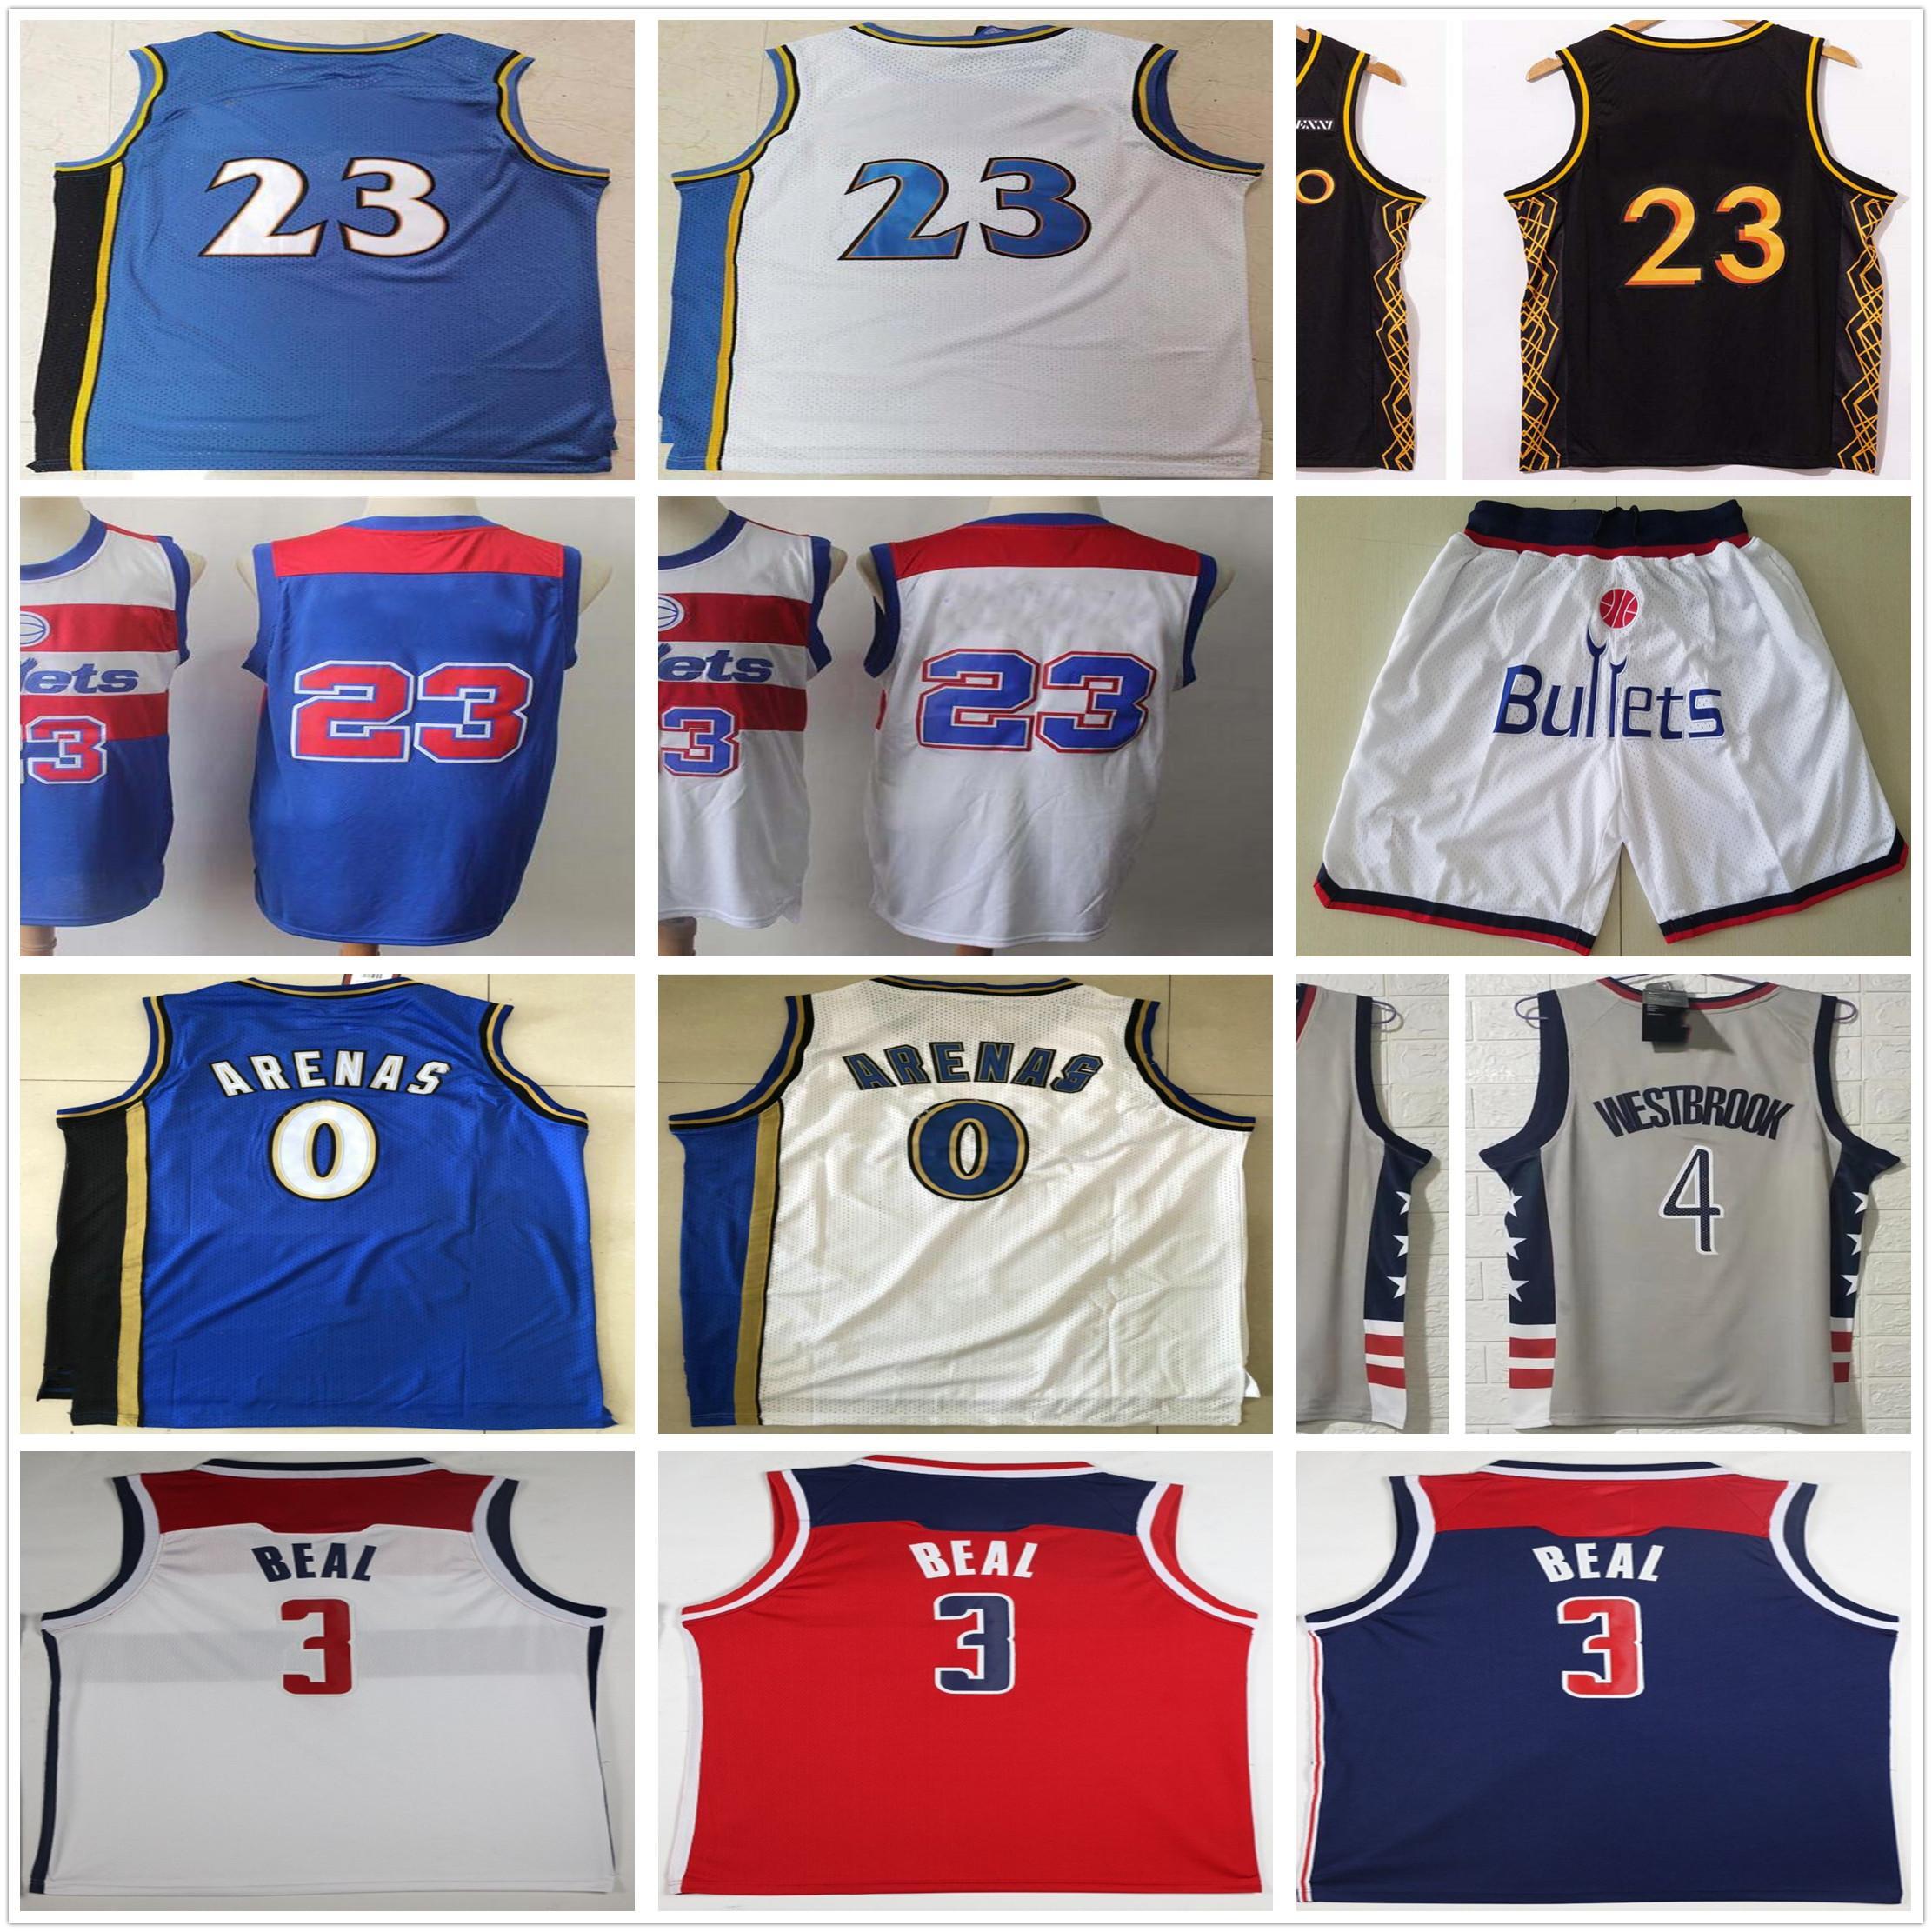 NCAA Bradley 3 BEAL 4 Westbrook Trikots Neue Grau Rot Blau Weiß # 23 Großhandel Billig Retro Vintage Classic Gilbert 0 Arenas Basketball Jersey